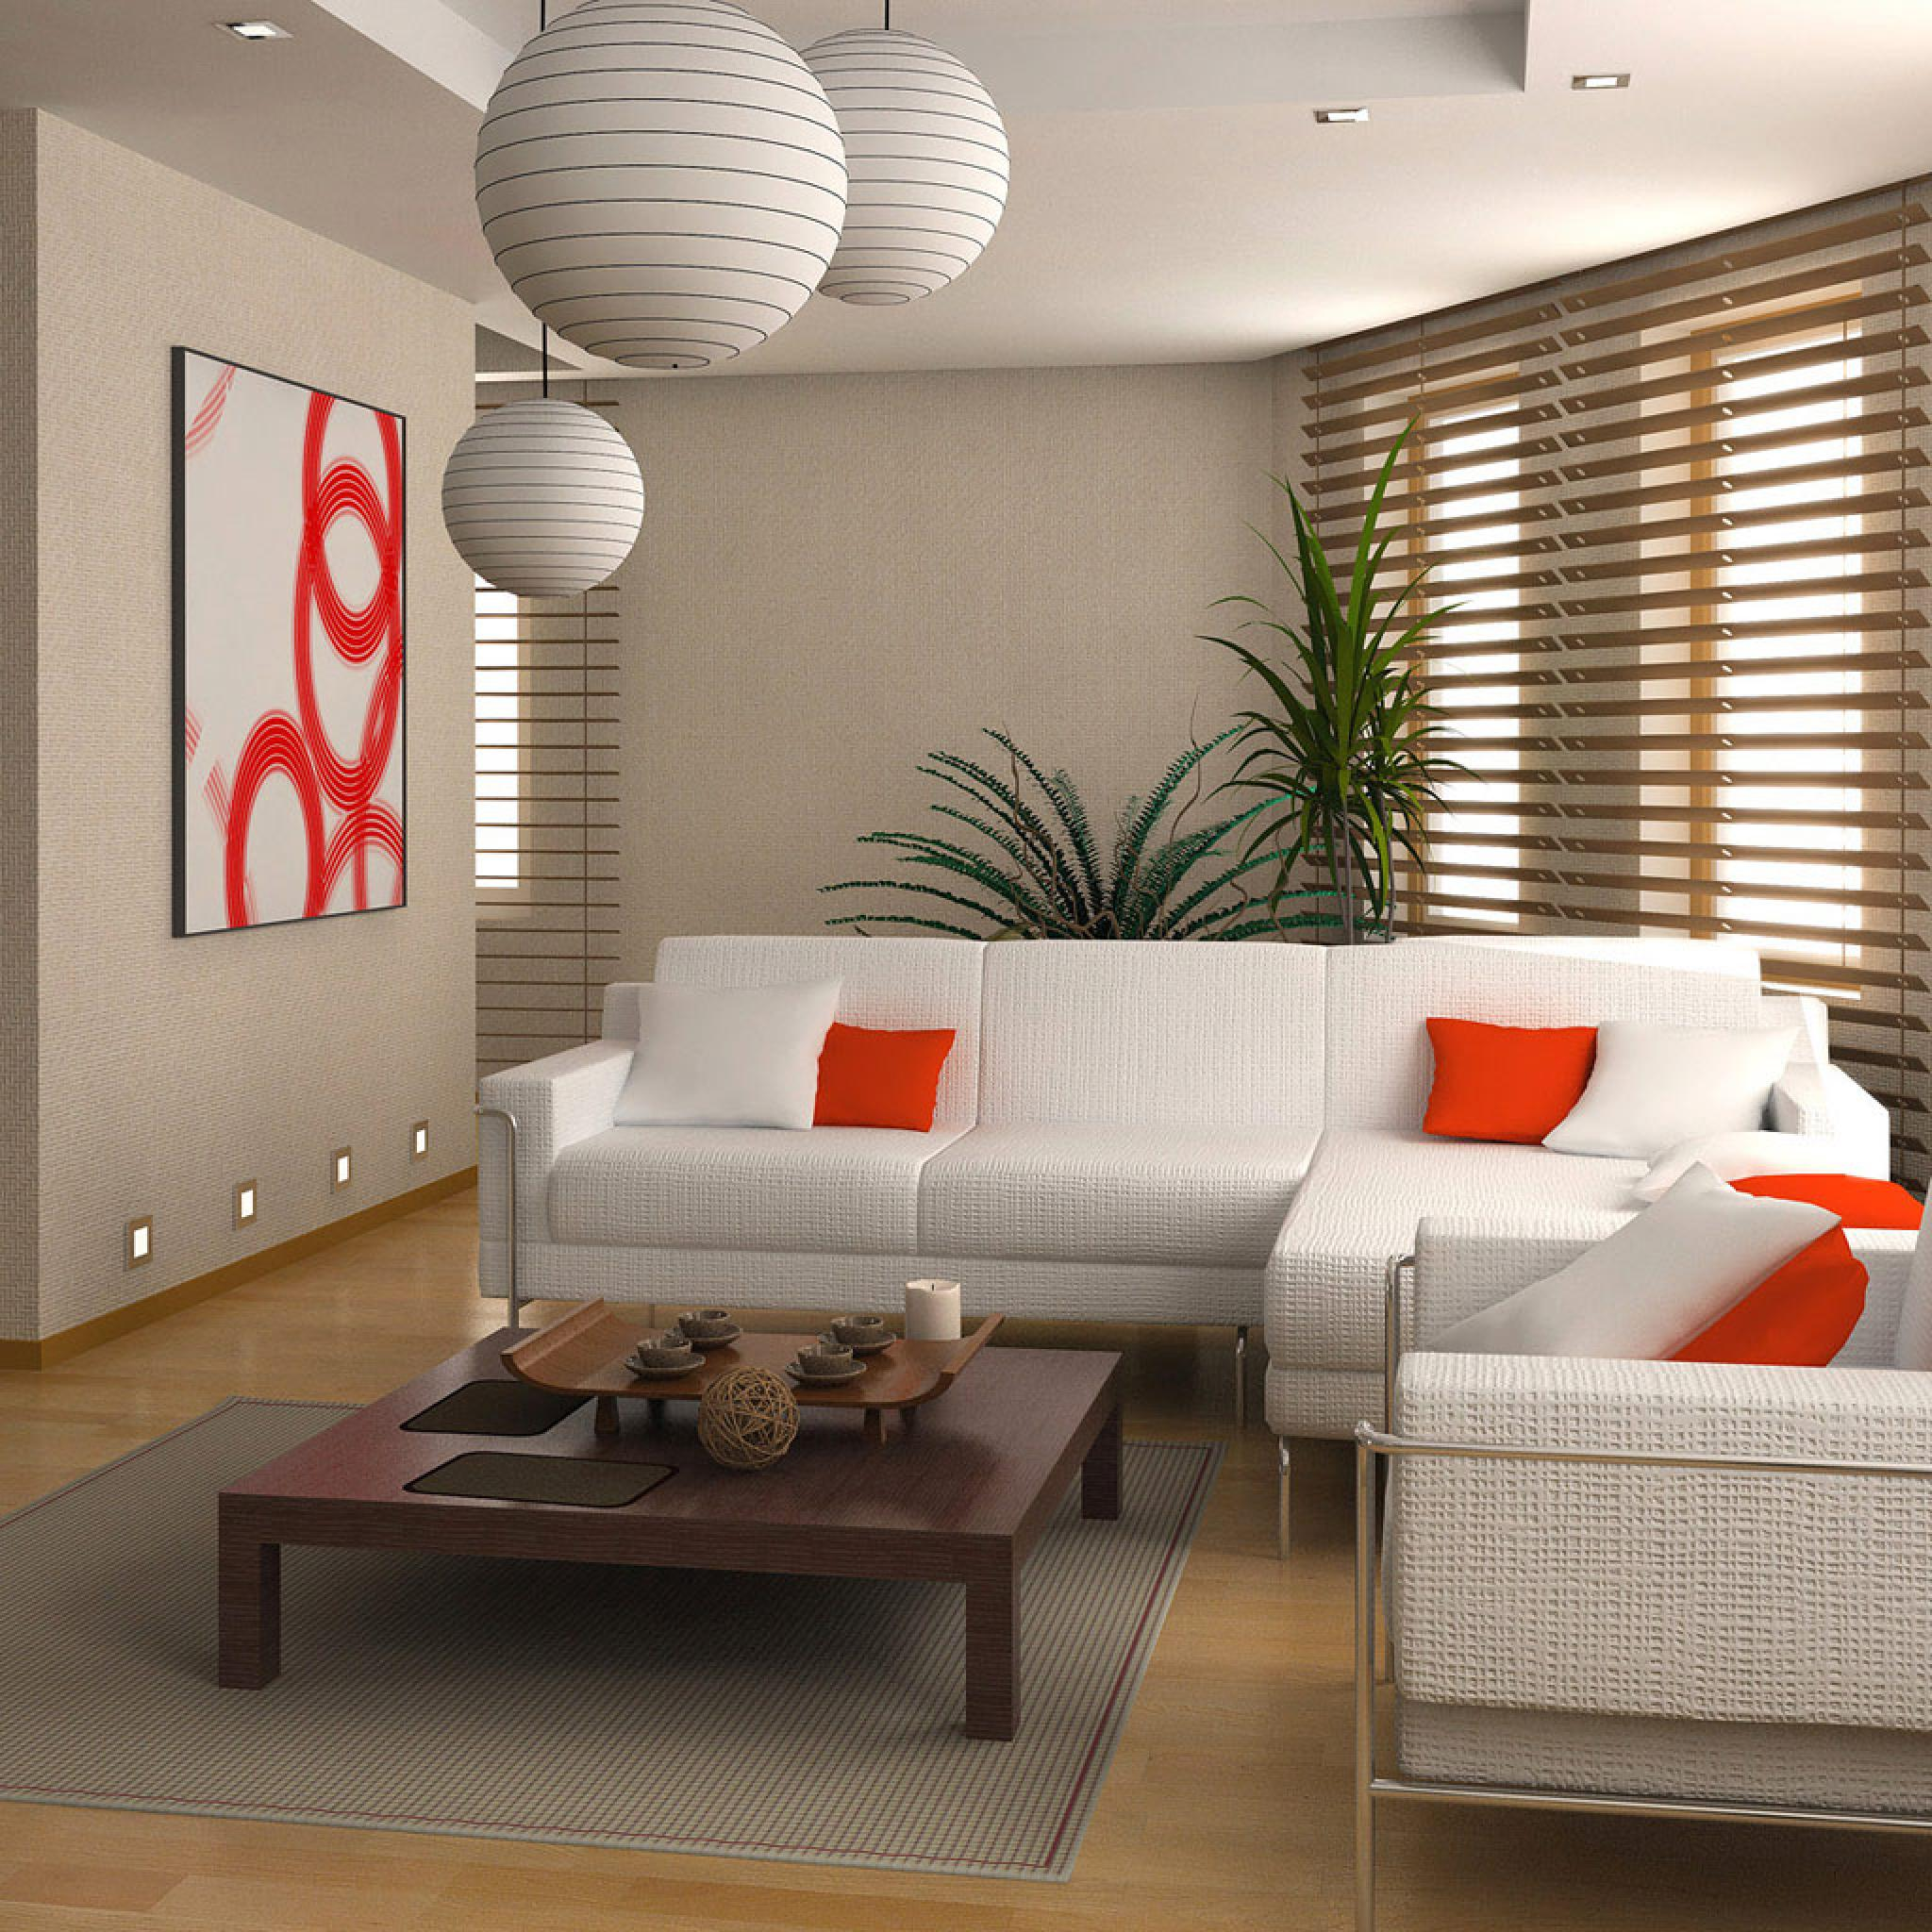 Miscellaneous   Modern Living Room Interior Design Ideas   iPad iPhone HD Wallpaper Free